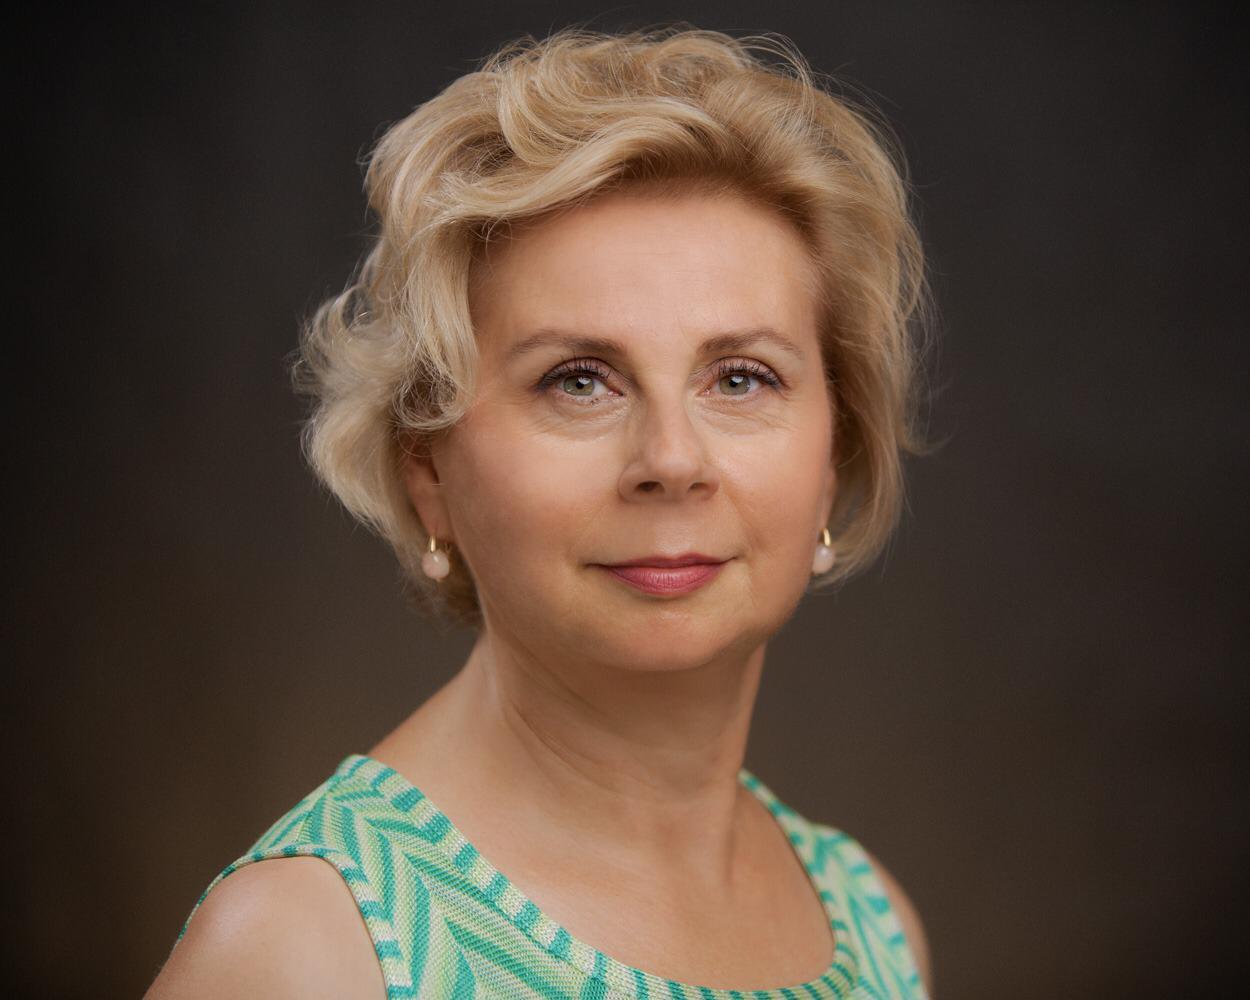 Maître Emmanuelle Glikson